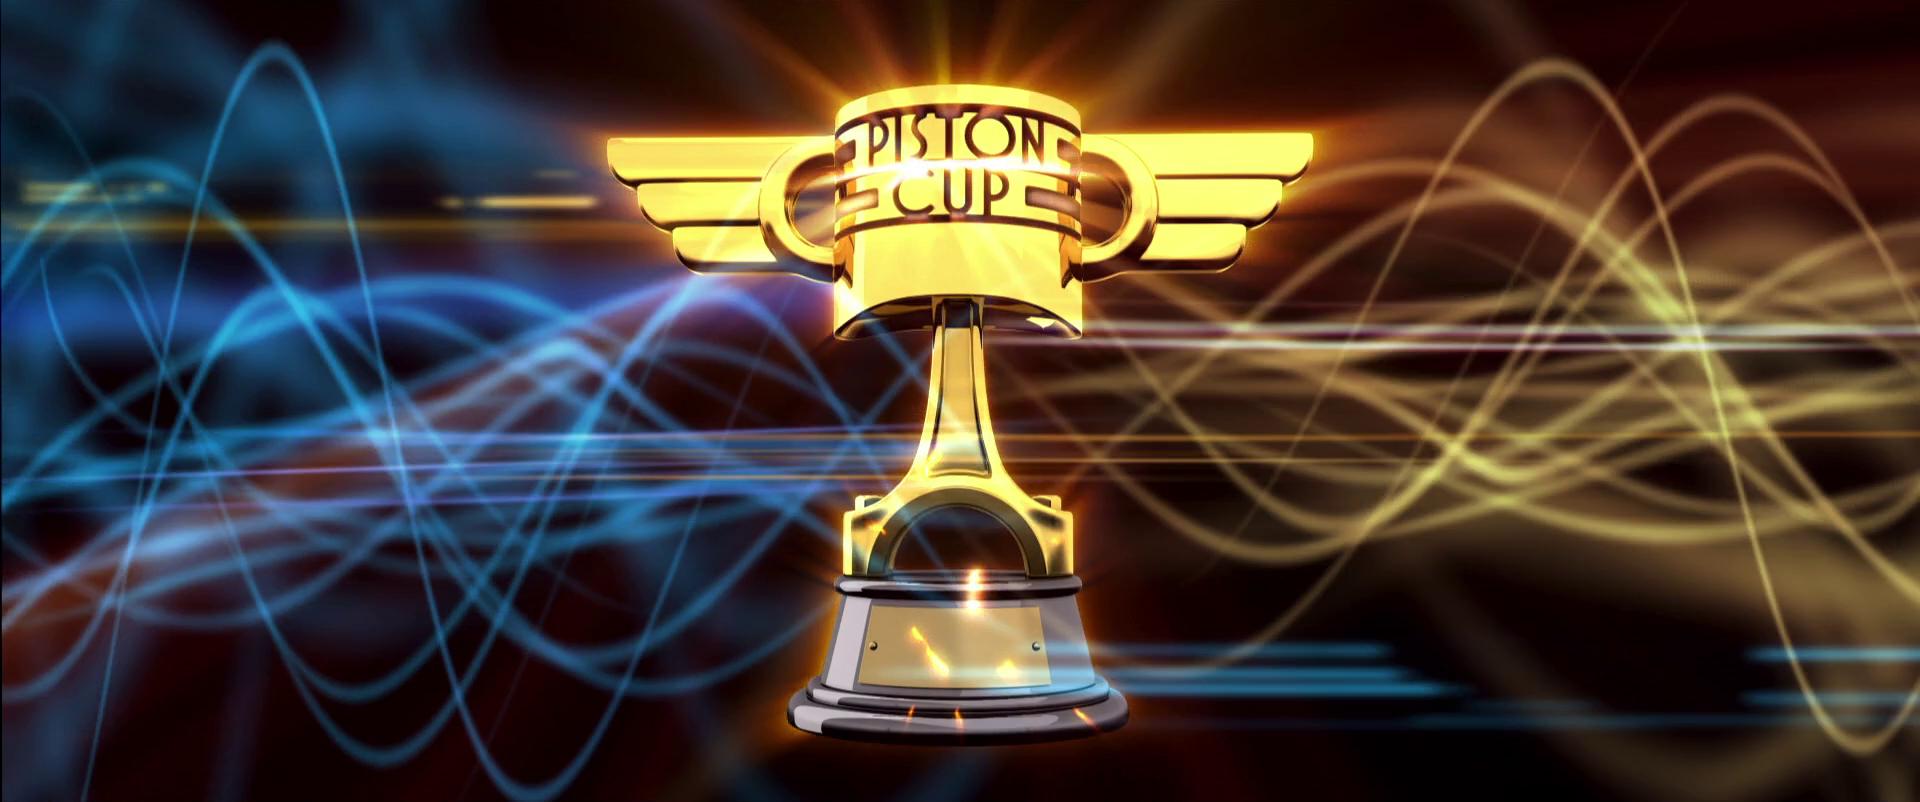 2005 Piston Cup Pixar Wiki